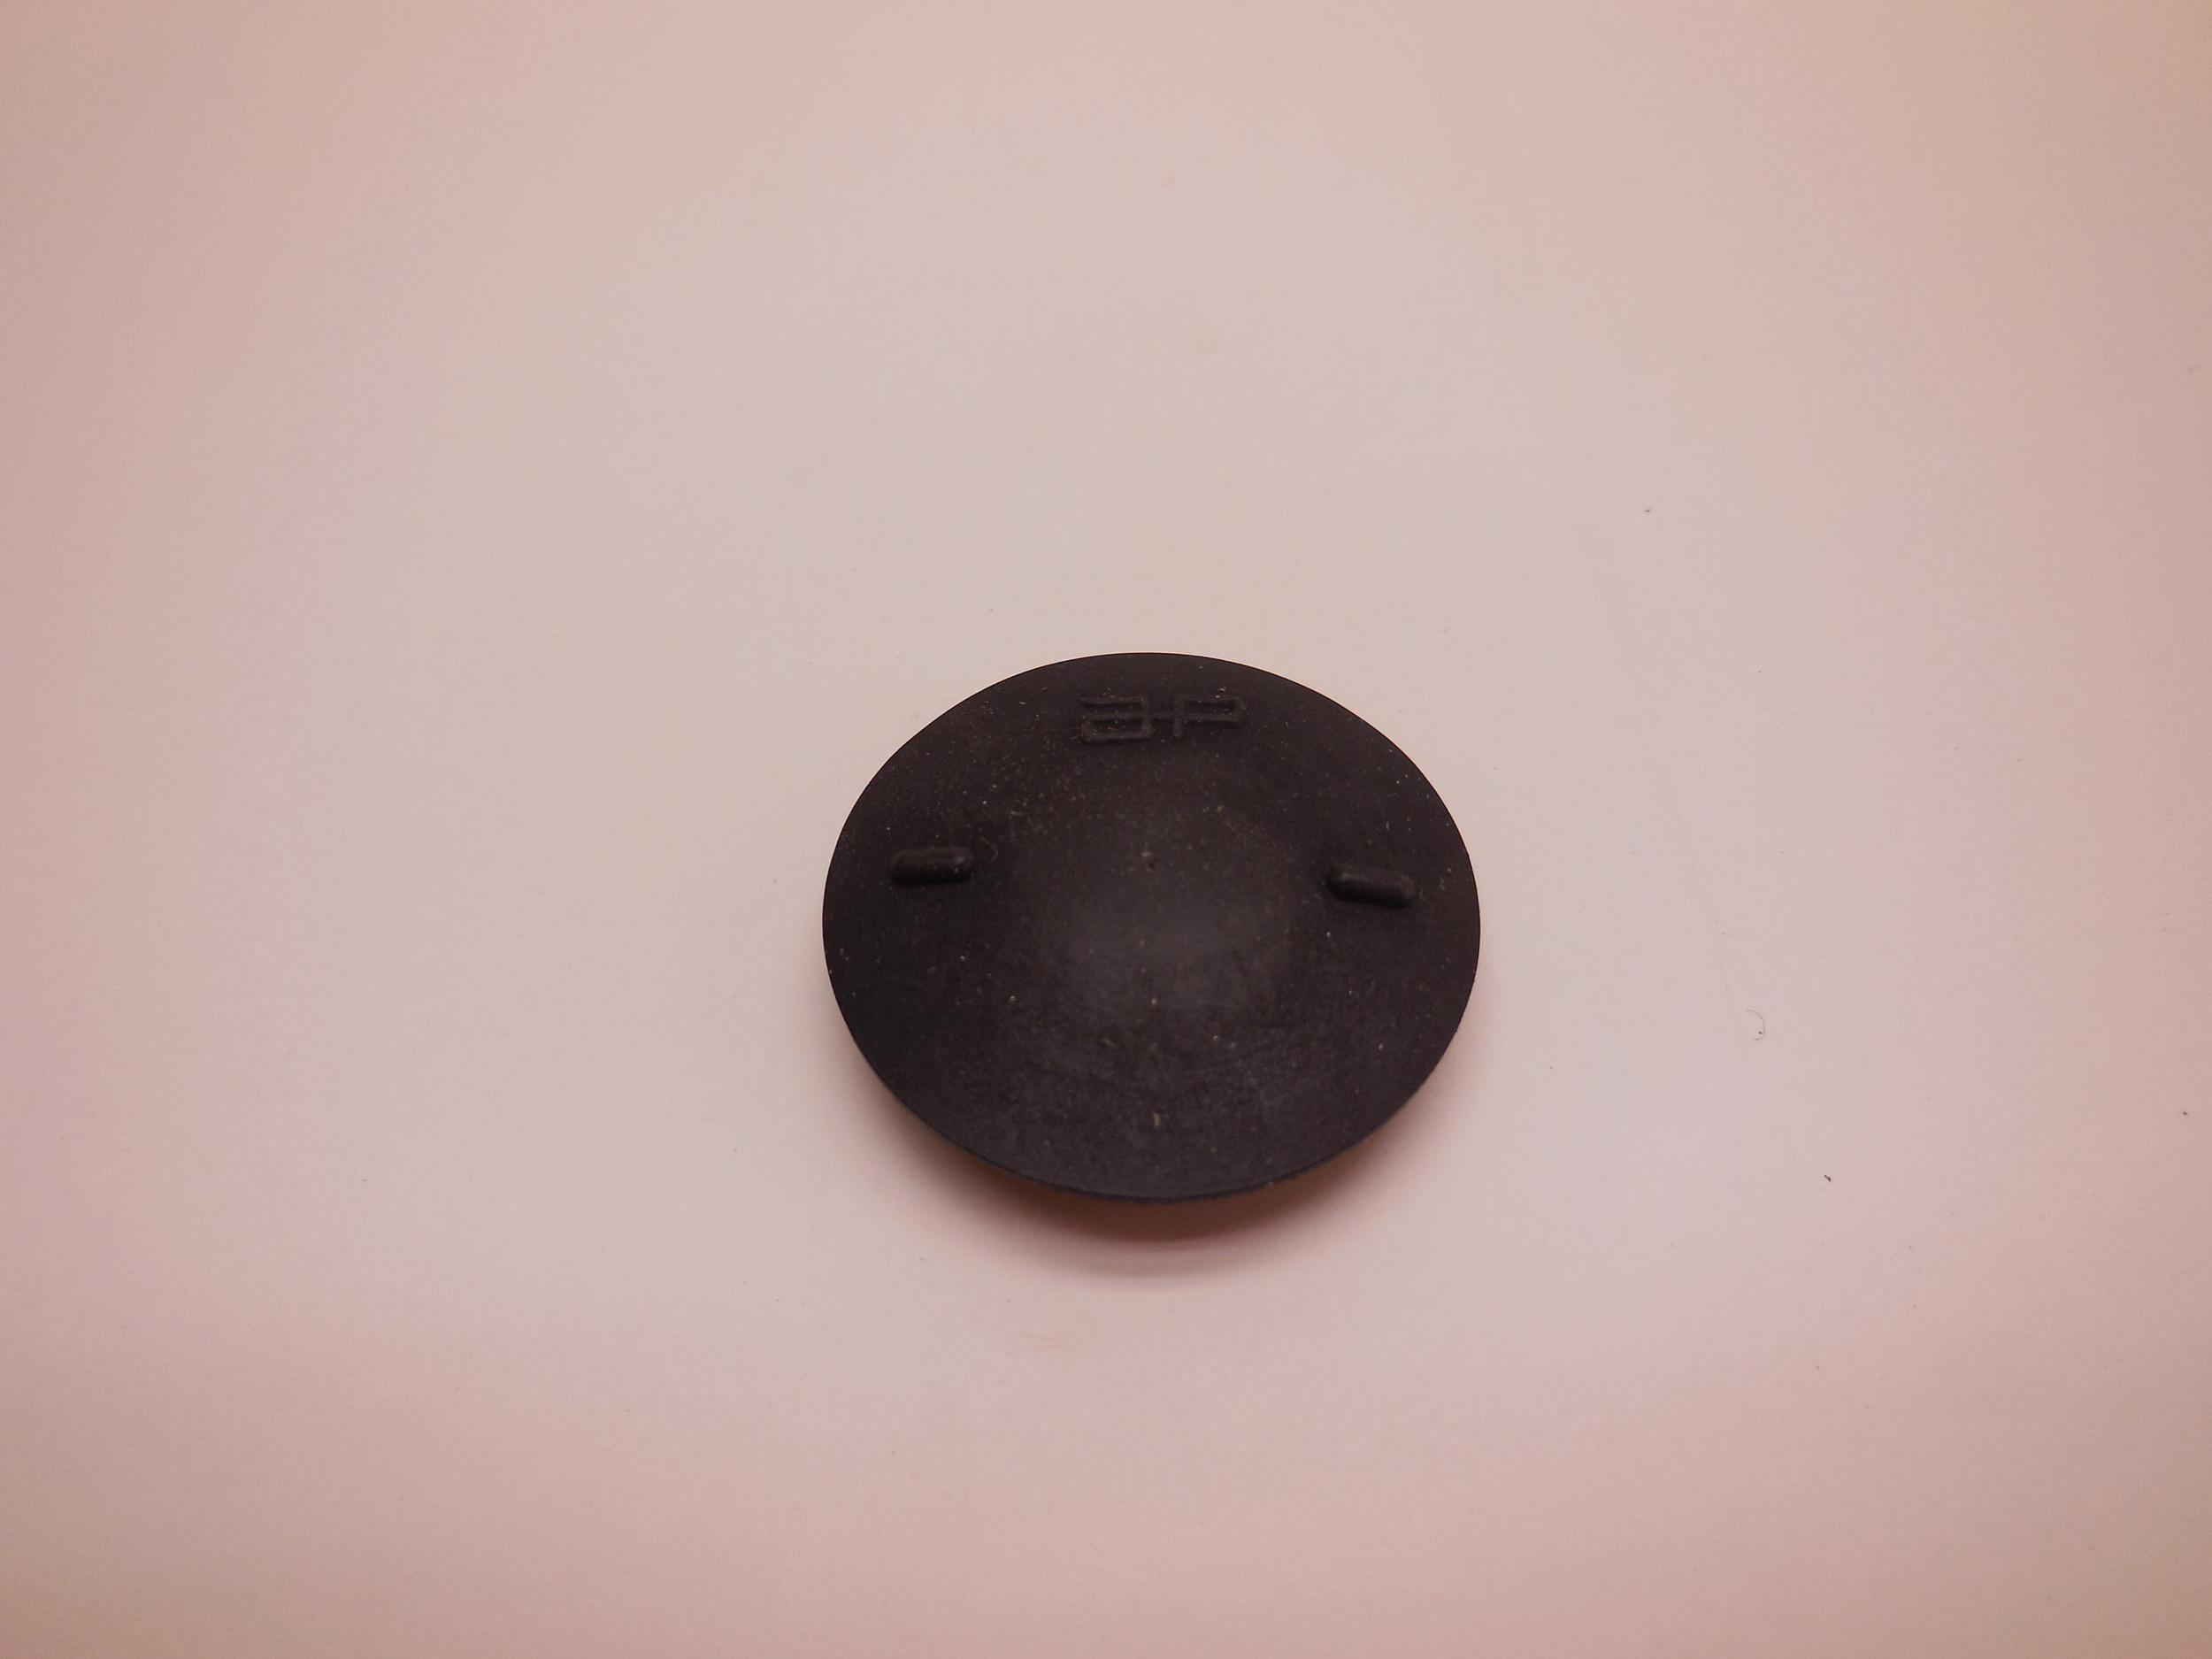 rubber lid price: 33 SEK